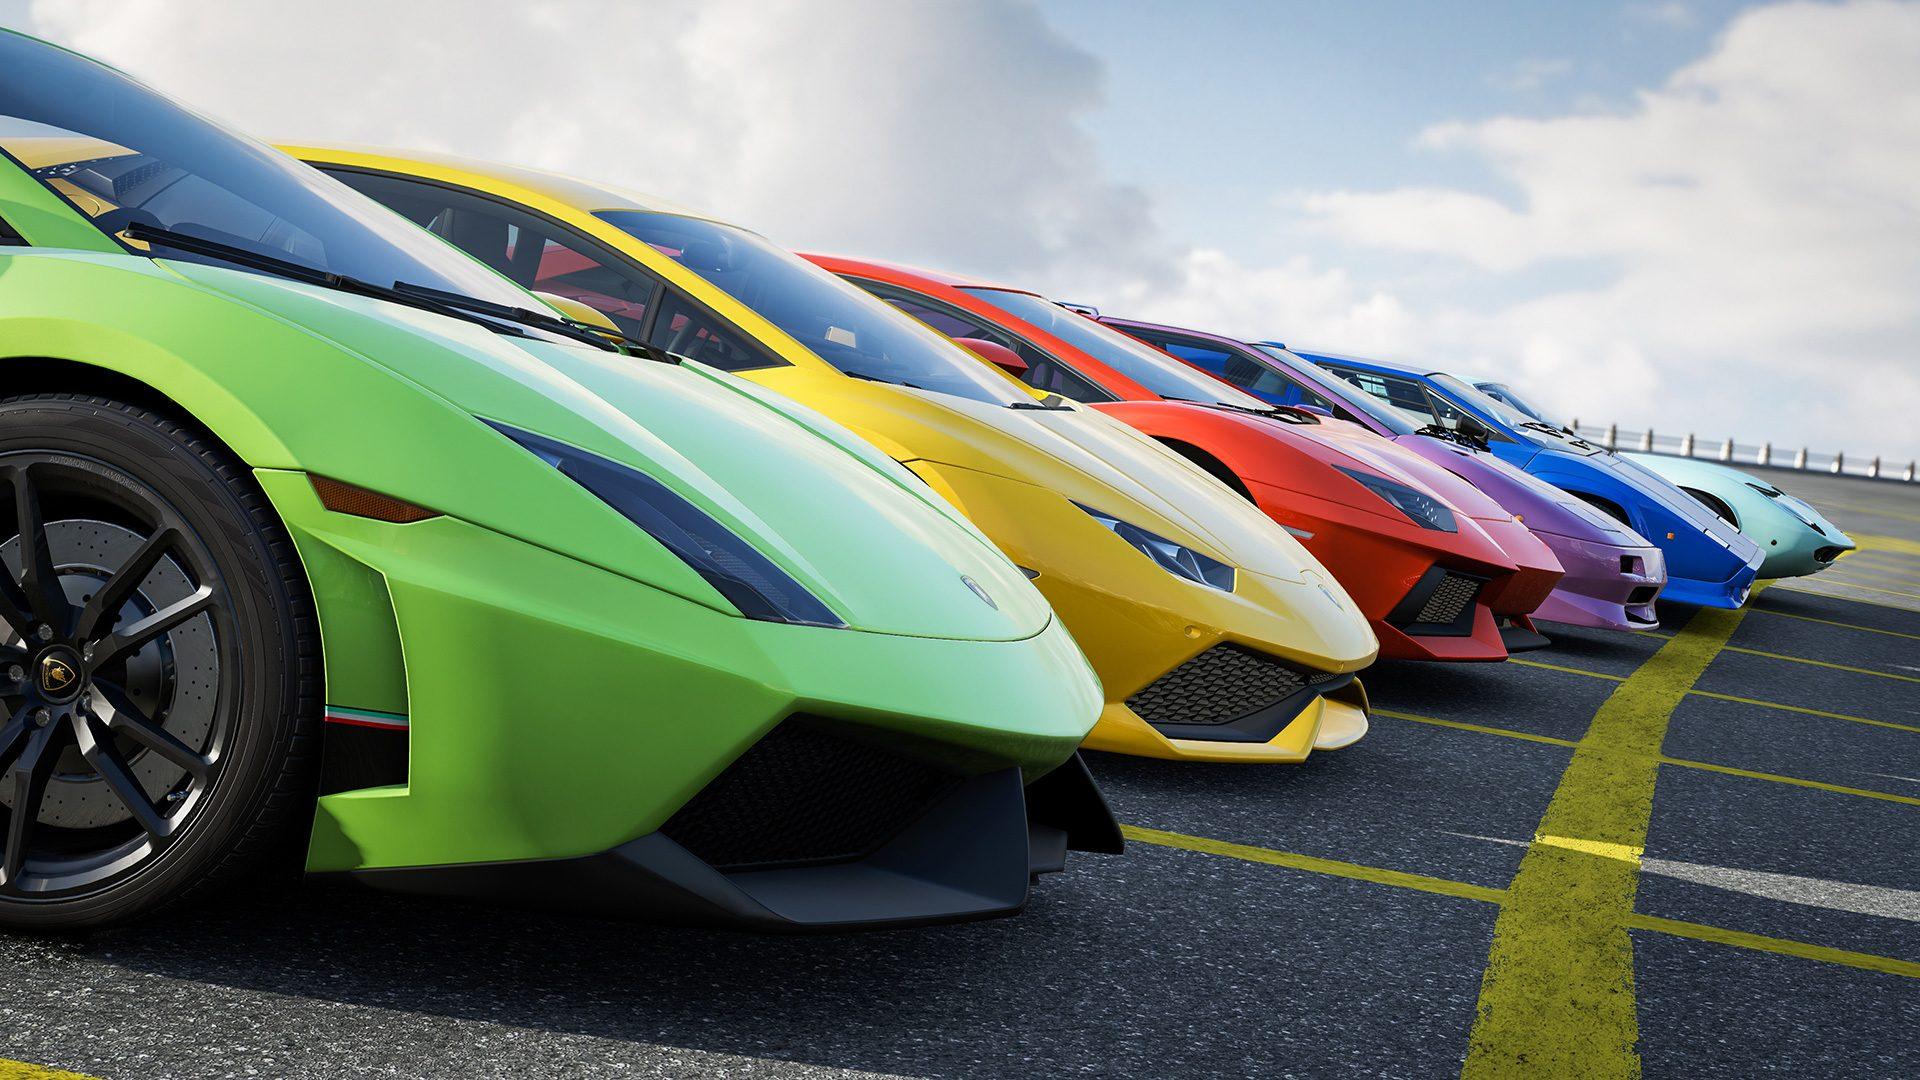 Hybrid Car Lineup Wallpaper 2018 Microsoft Announce Lamborghini Centenario As Next Forza